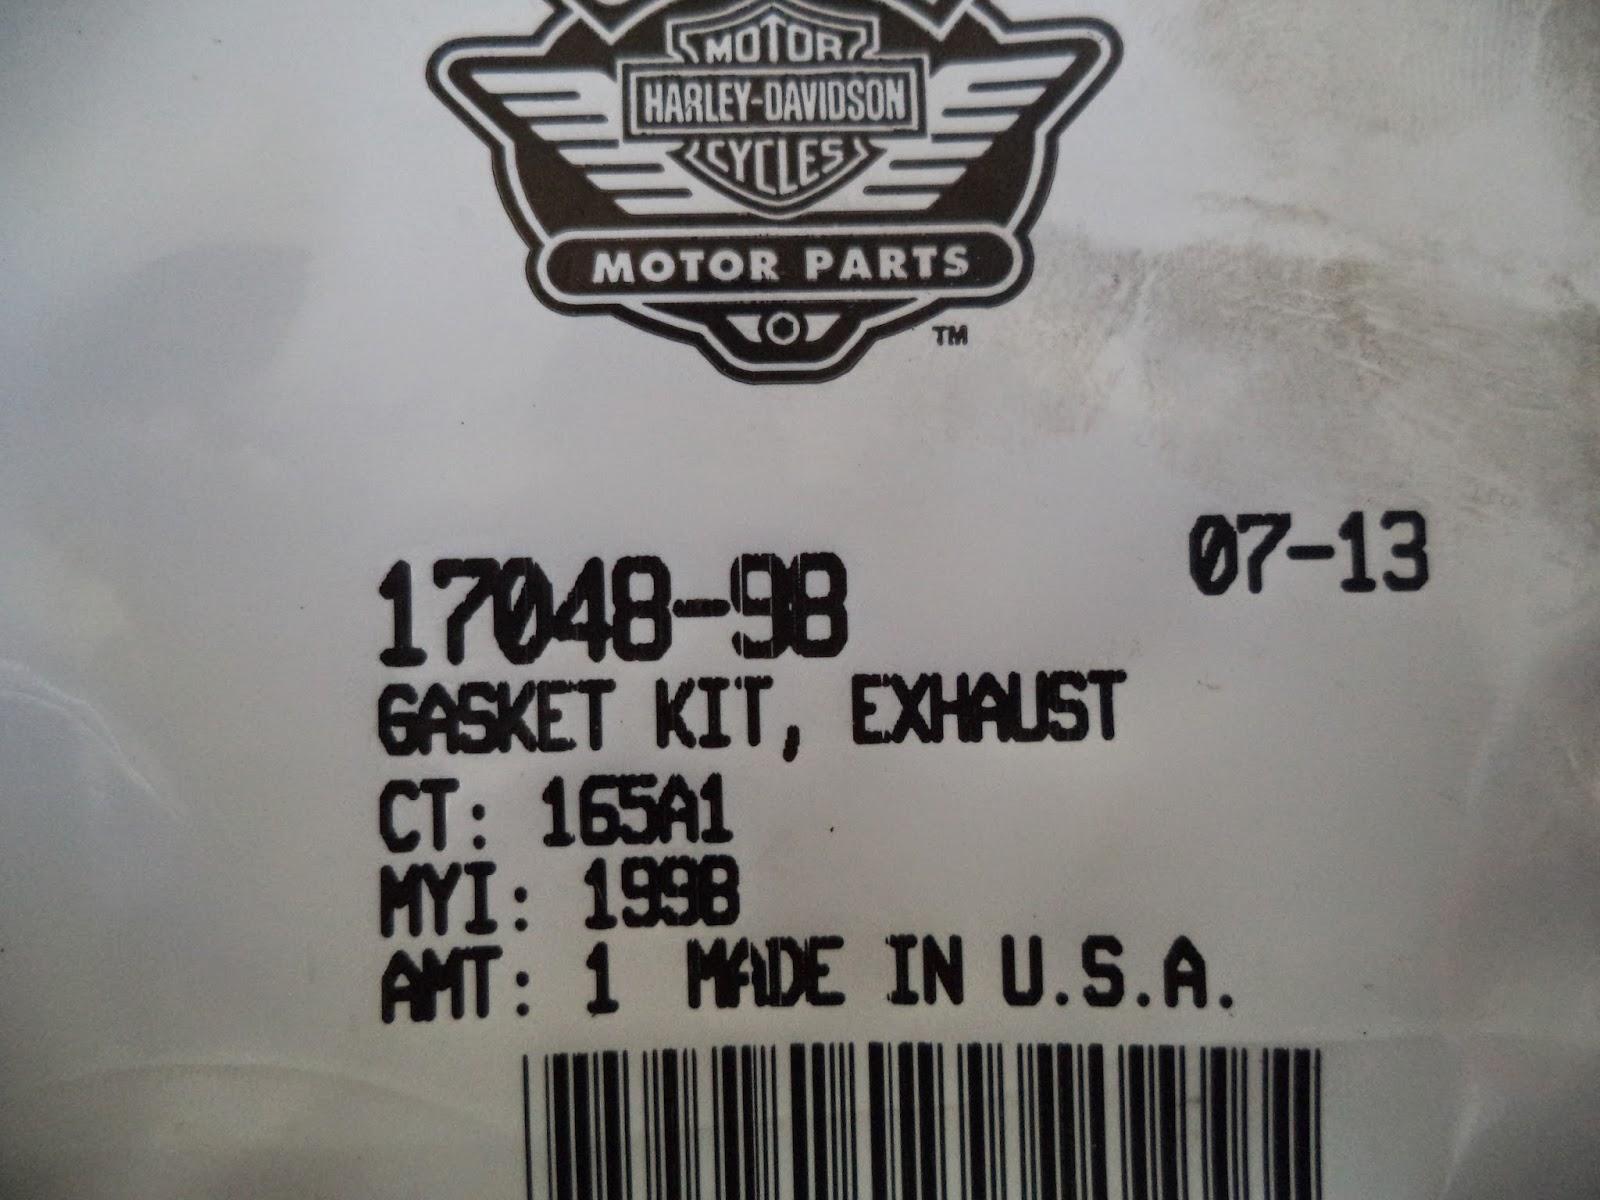 Tear it up, fix it, repeat: Exhaust Leak Fixed - Hopefully